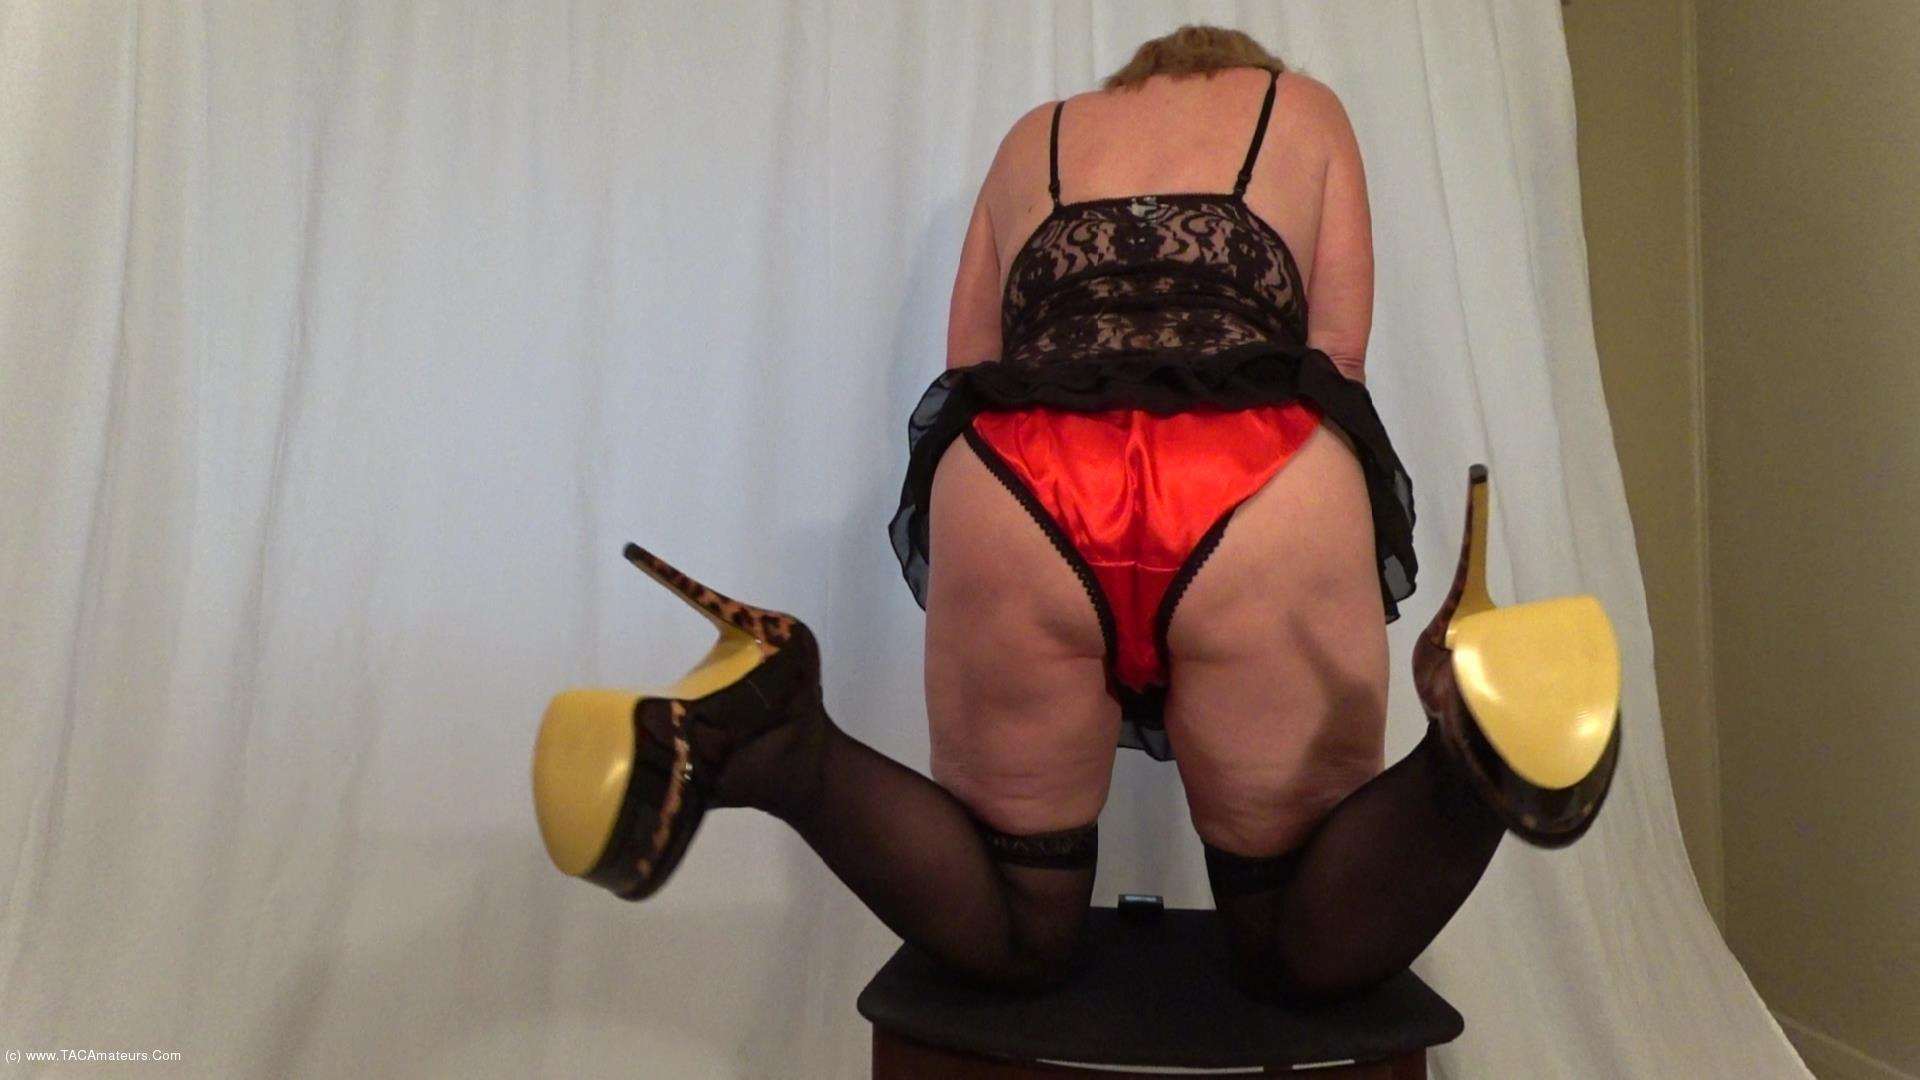 CougarBabeJolee - Cum Get My Arse & Take My Satin Panties Down scene 0